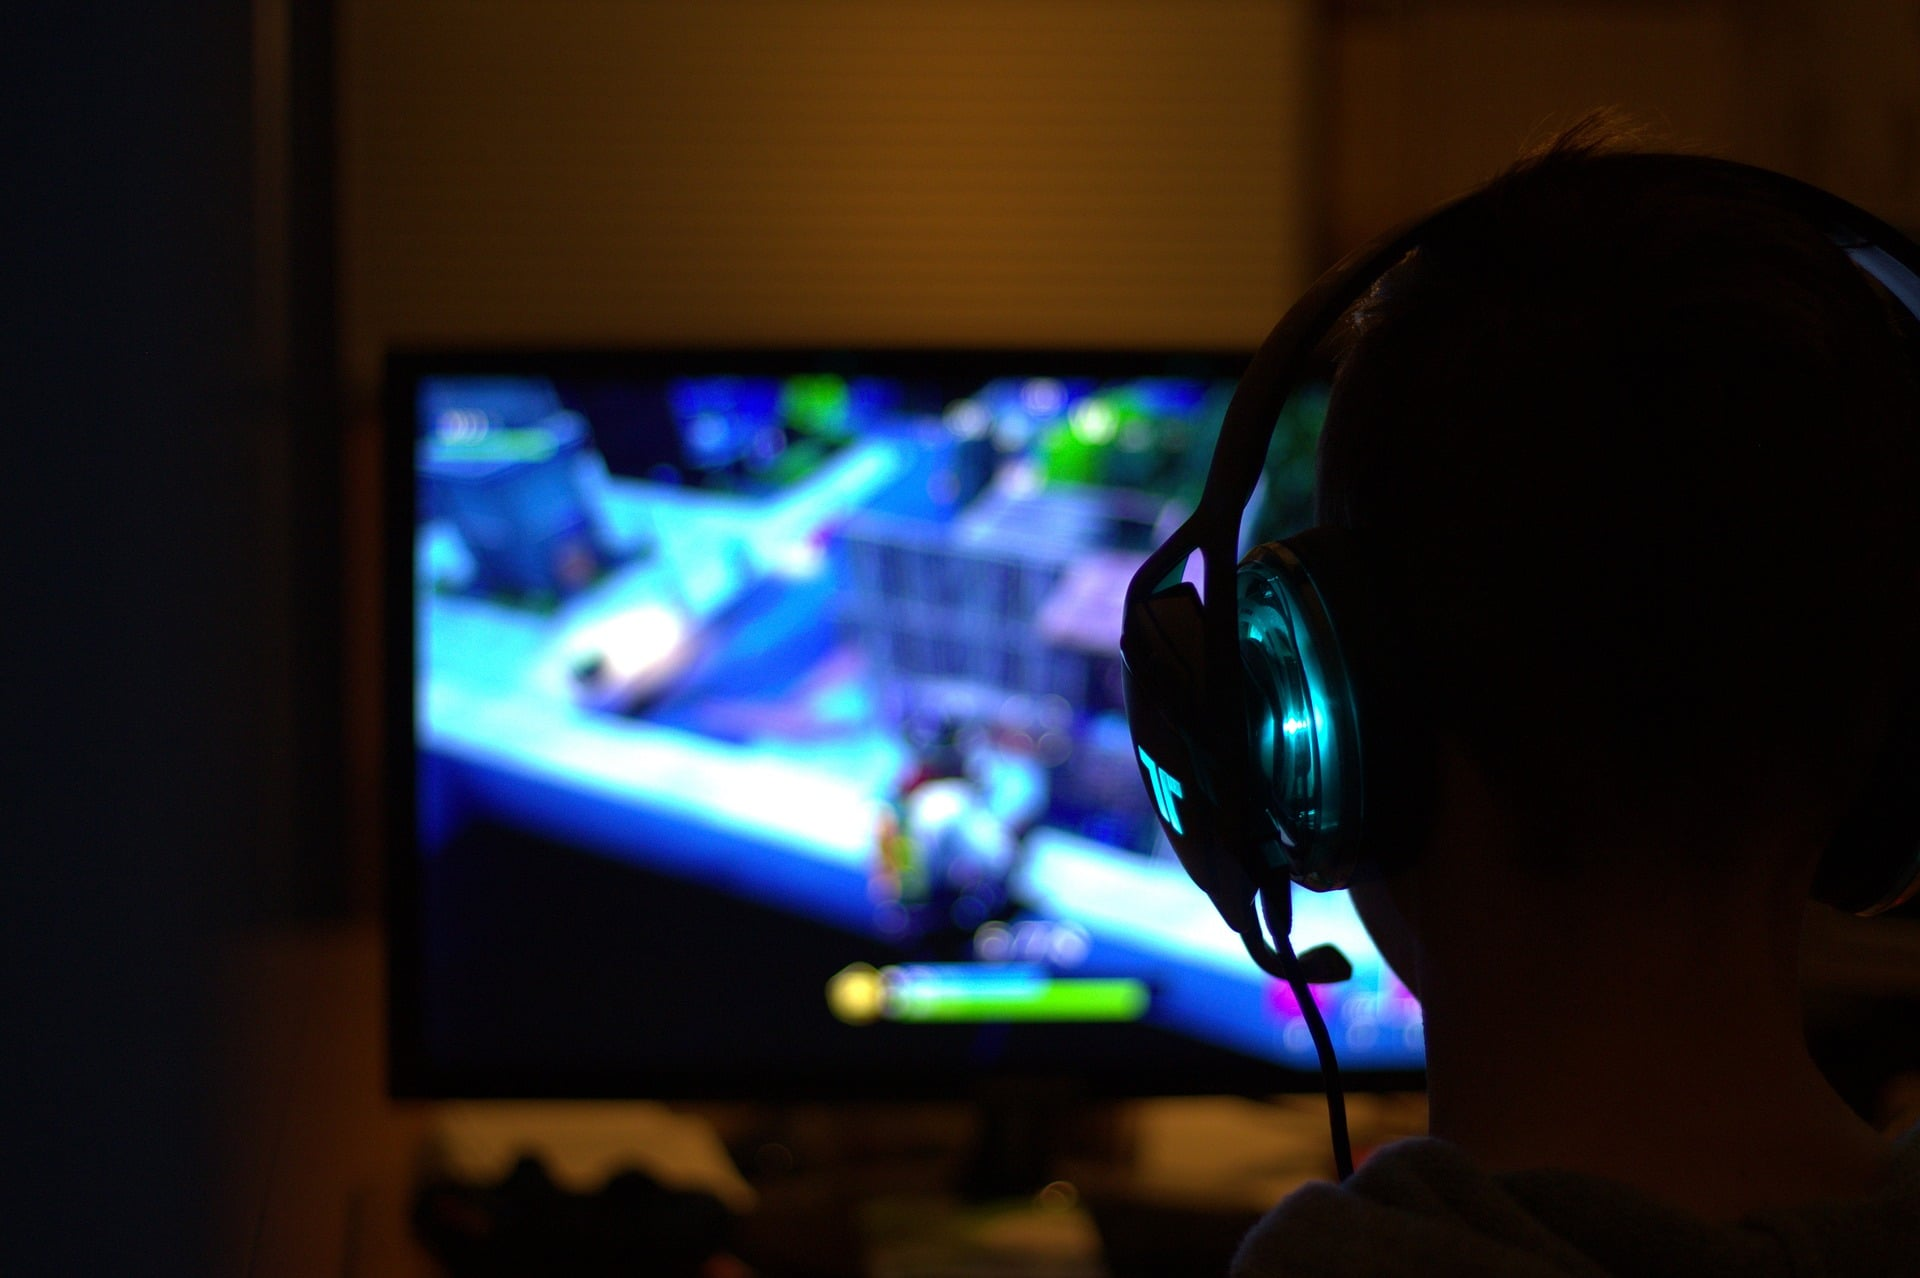 Esports-Turnier-Open-Series-Pro-Gamer